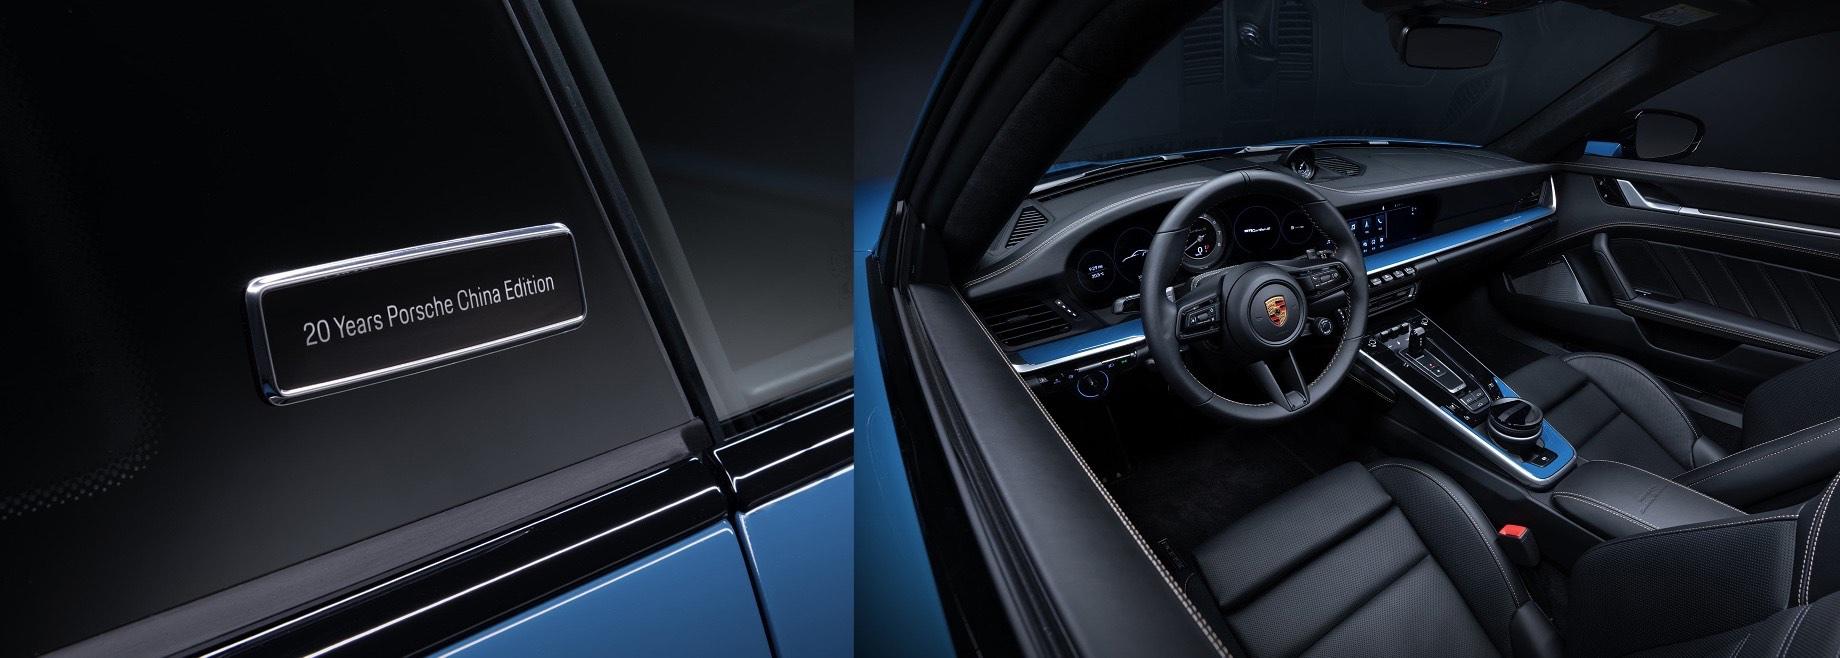 Porsche 911 Turbo S предложил уникальную палитру для Китая